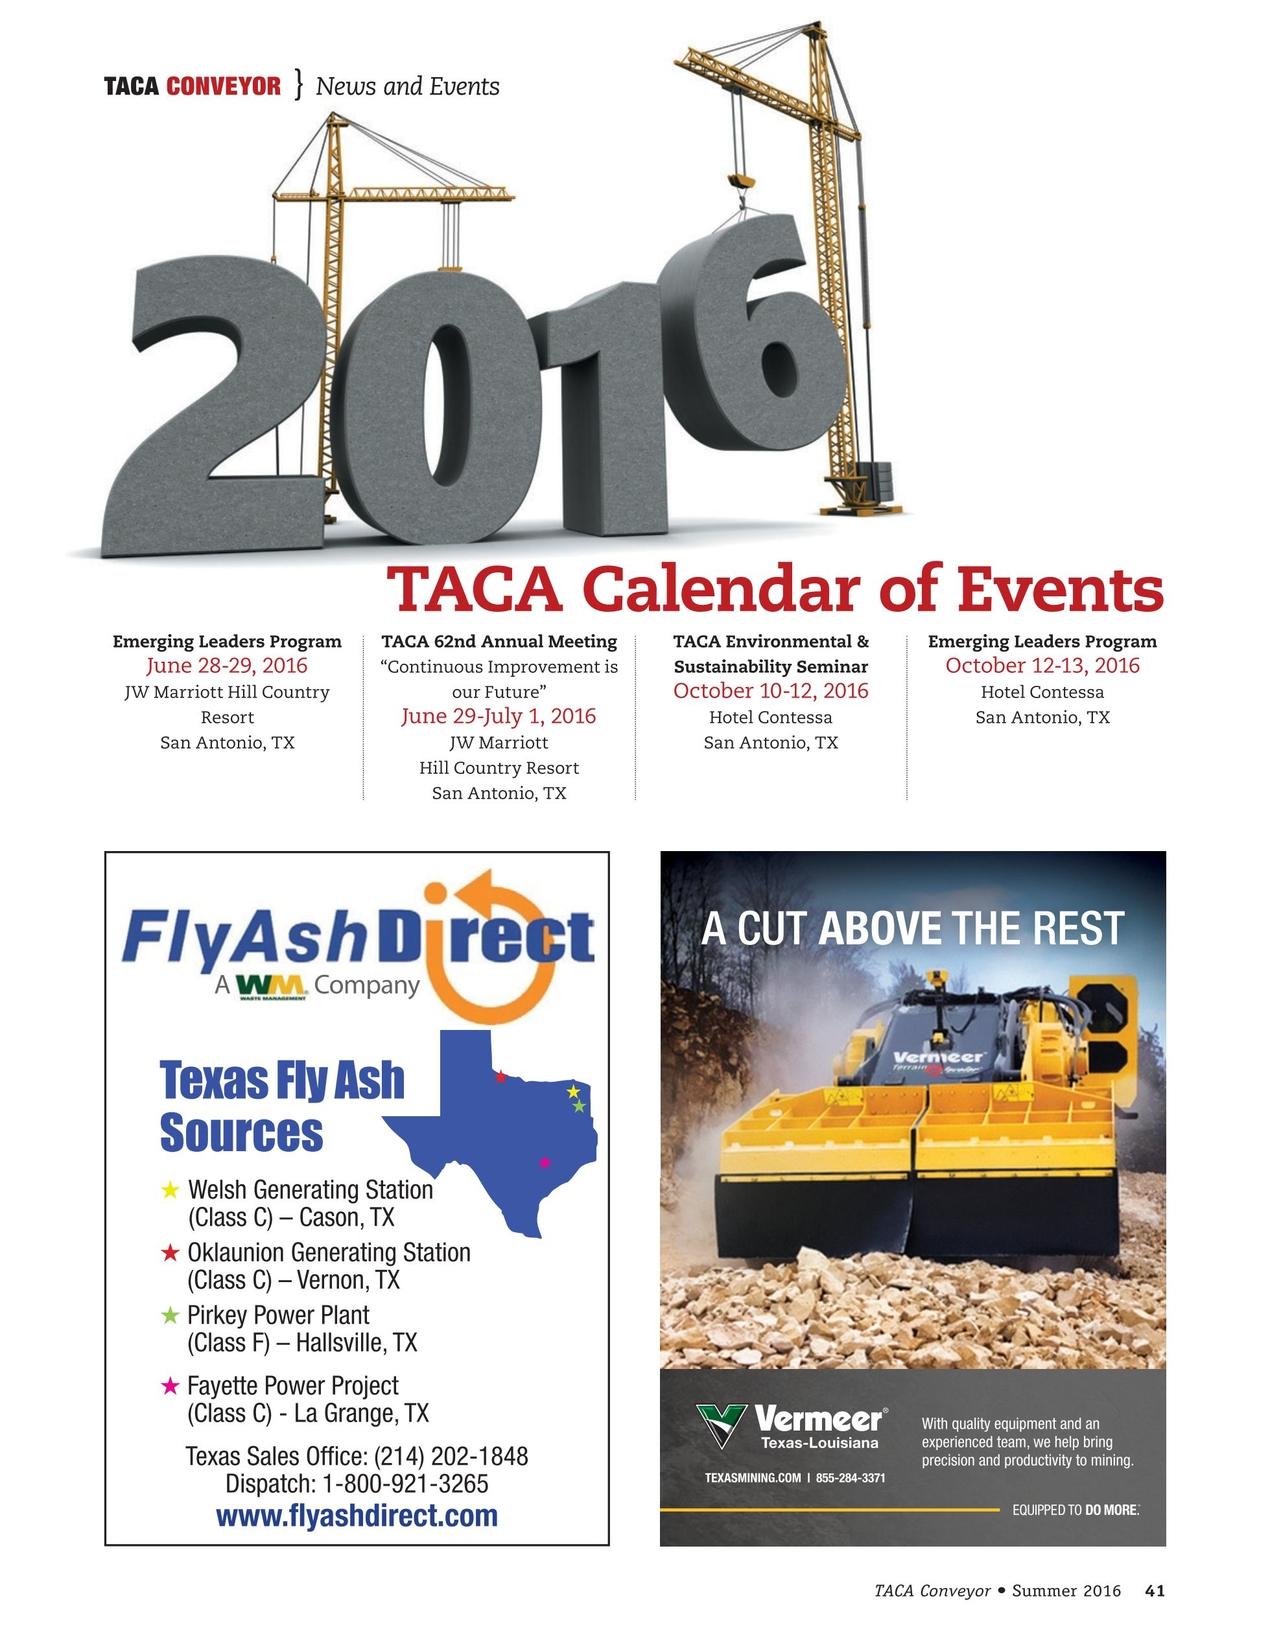 TACA Conveyor - Summer 2016